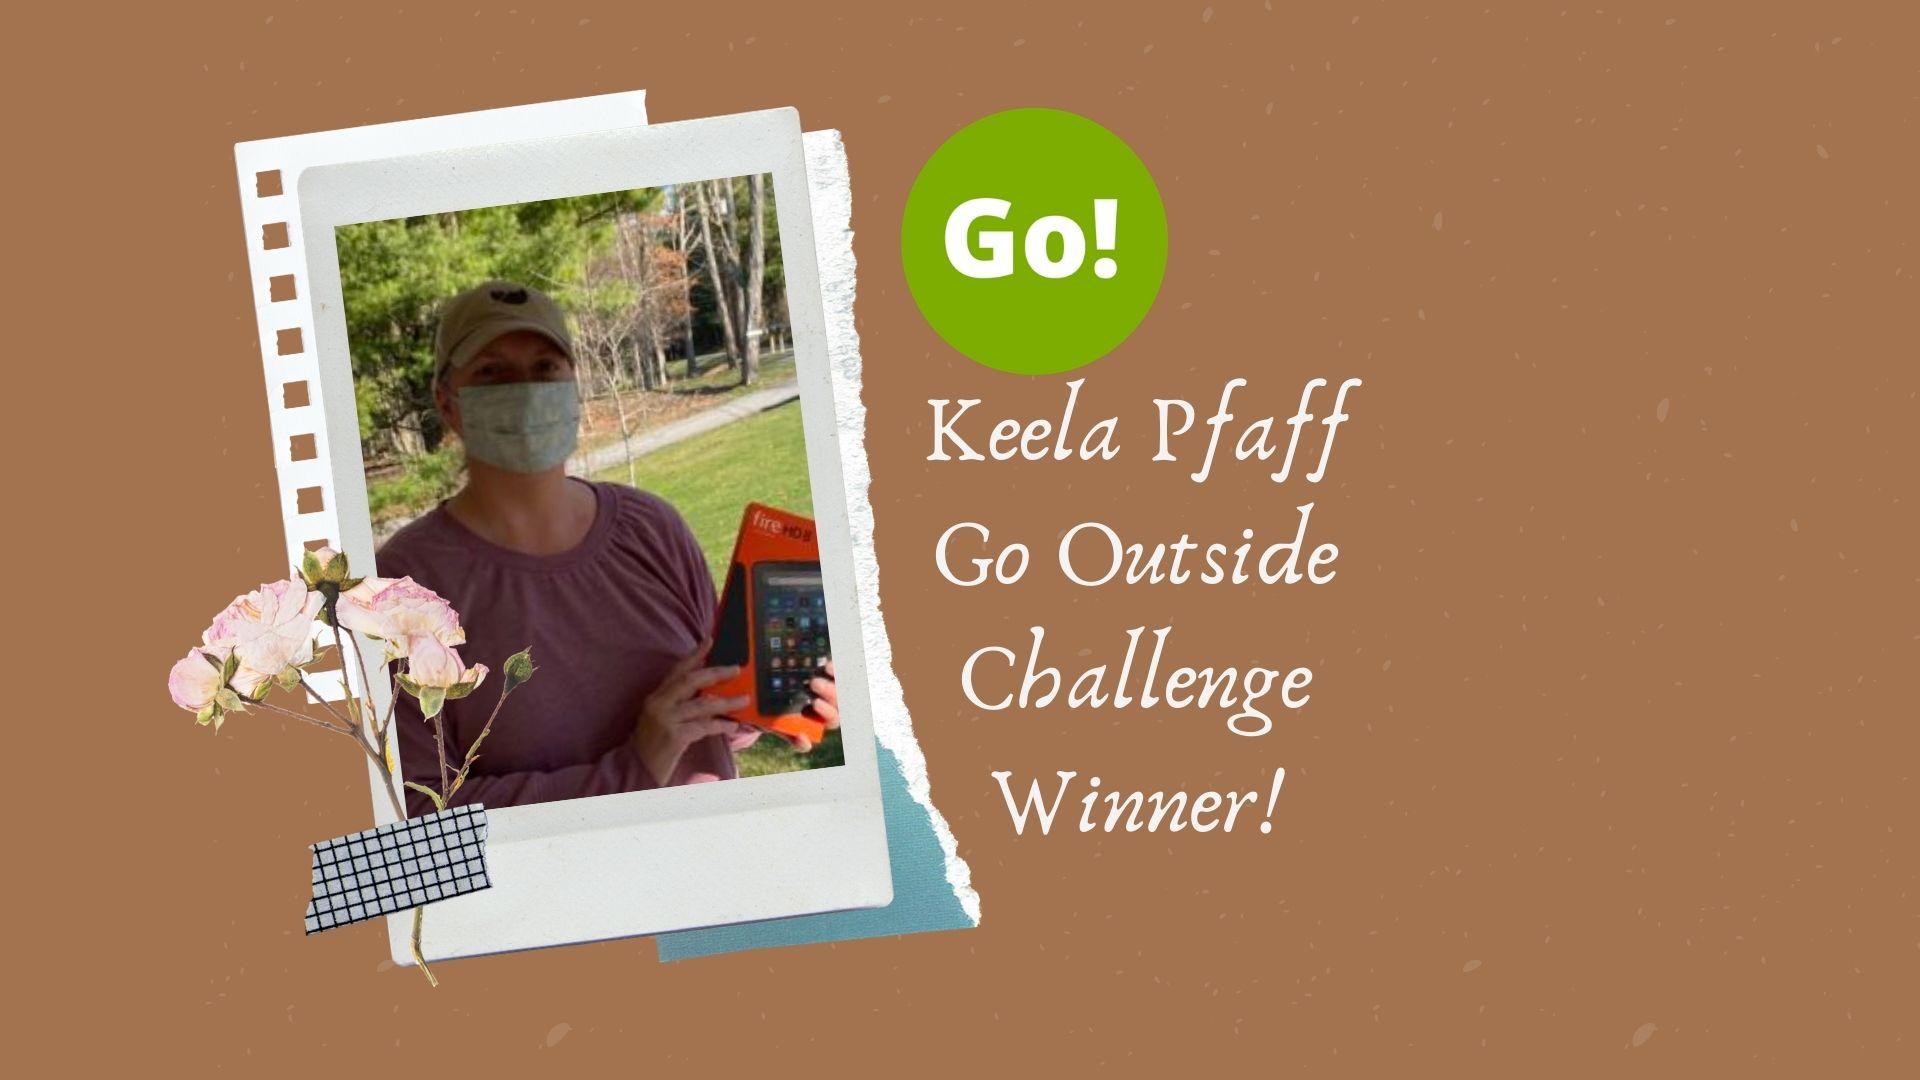 Prize Winner, Keela Pfaff – +3 Prize Points